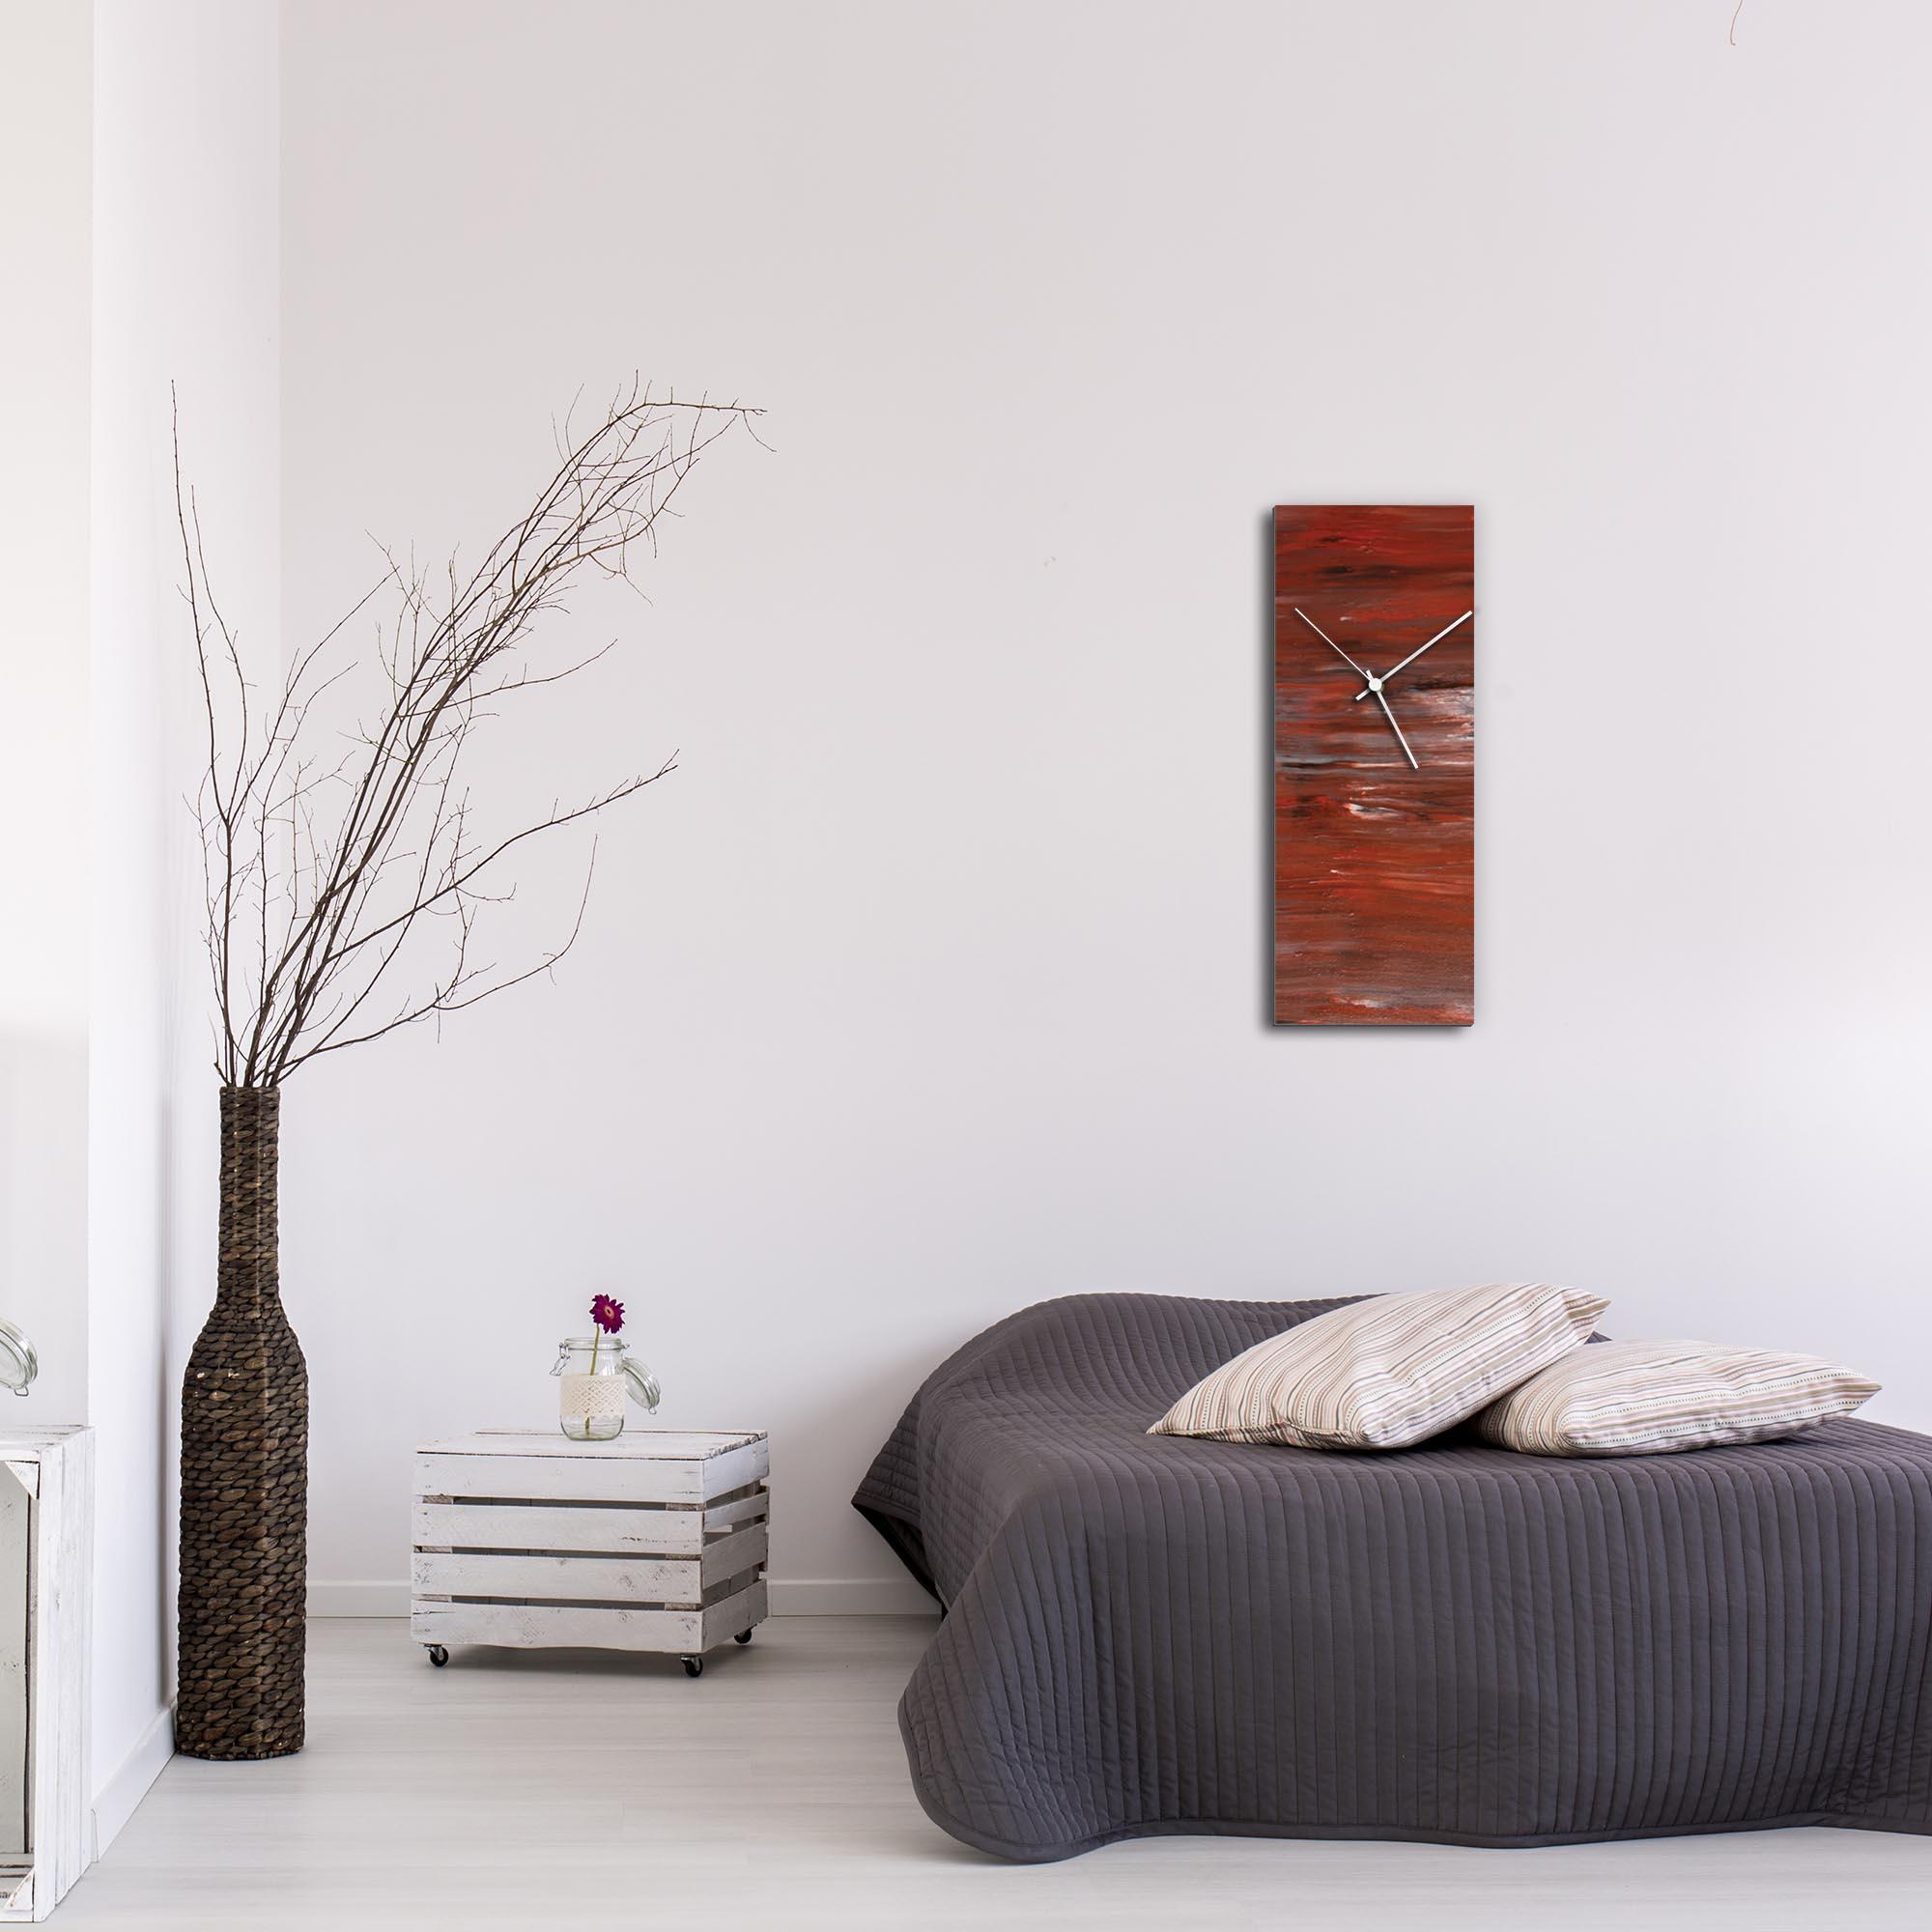 City Brick Clock Large by Mendo Vasilevski - Urban Abstract Home Decor - Lifestyle View